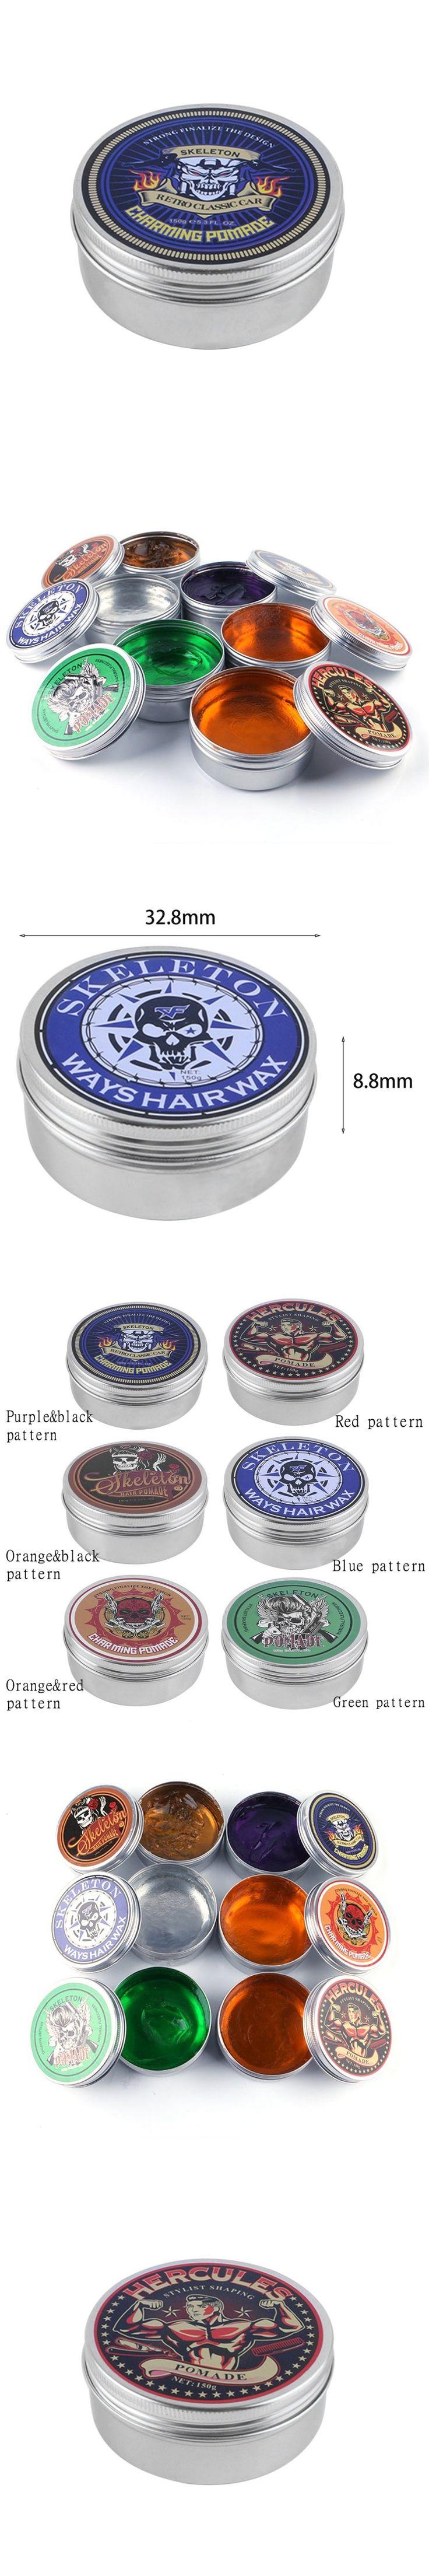 Fashion Aluminium Box Hair Pomade 150g Durable Modeling Hairstyle Wax Hairstyle Shaping Wax Cream Modeling Hair Wax new